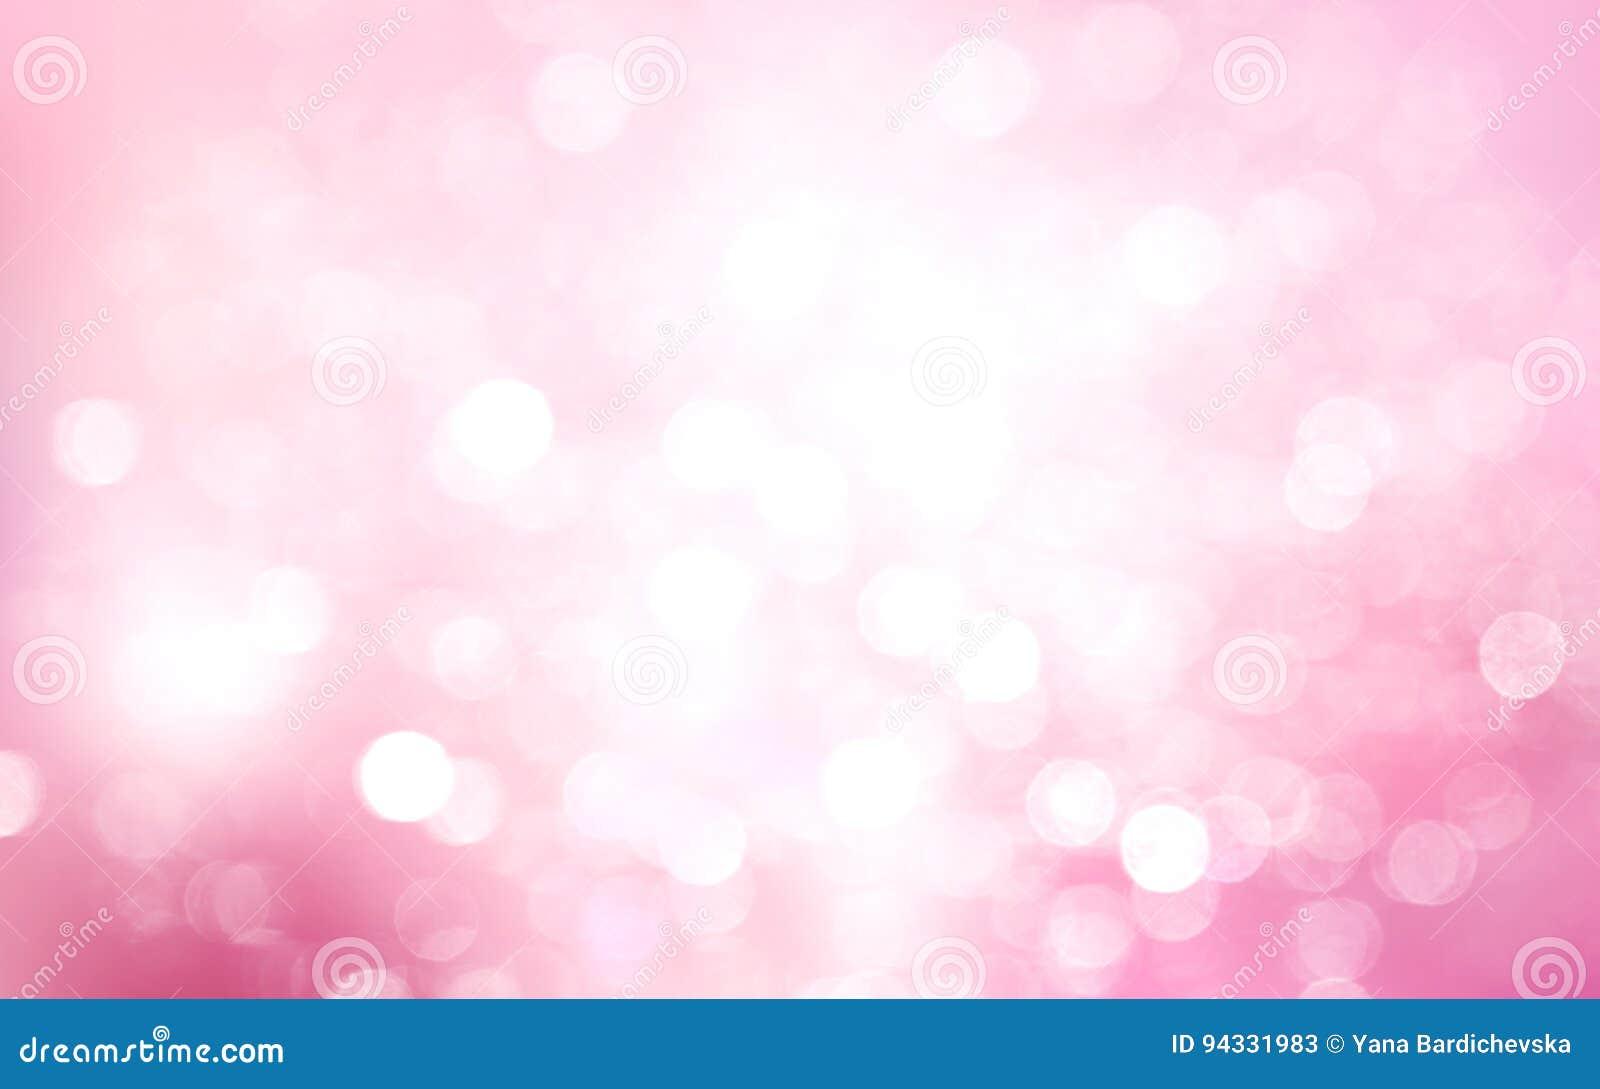 pink white blurred bokeh background splash design holiday xmas christmas wallpaper valentine day card romantic blur 94331983